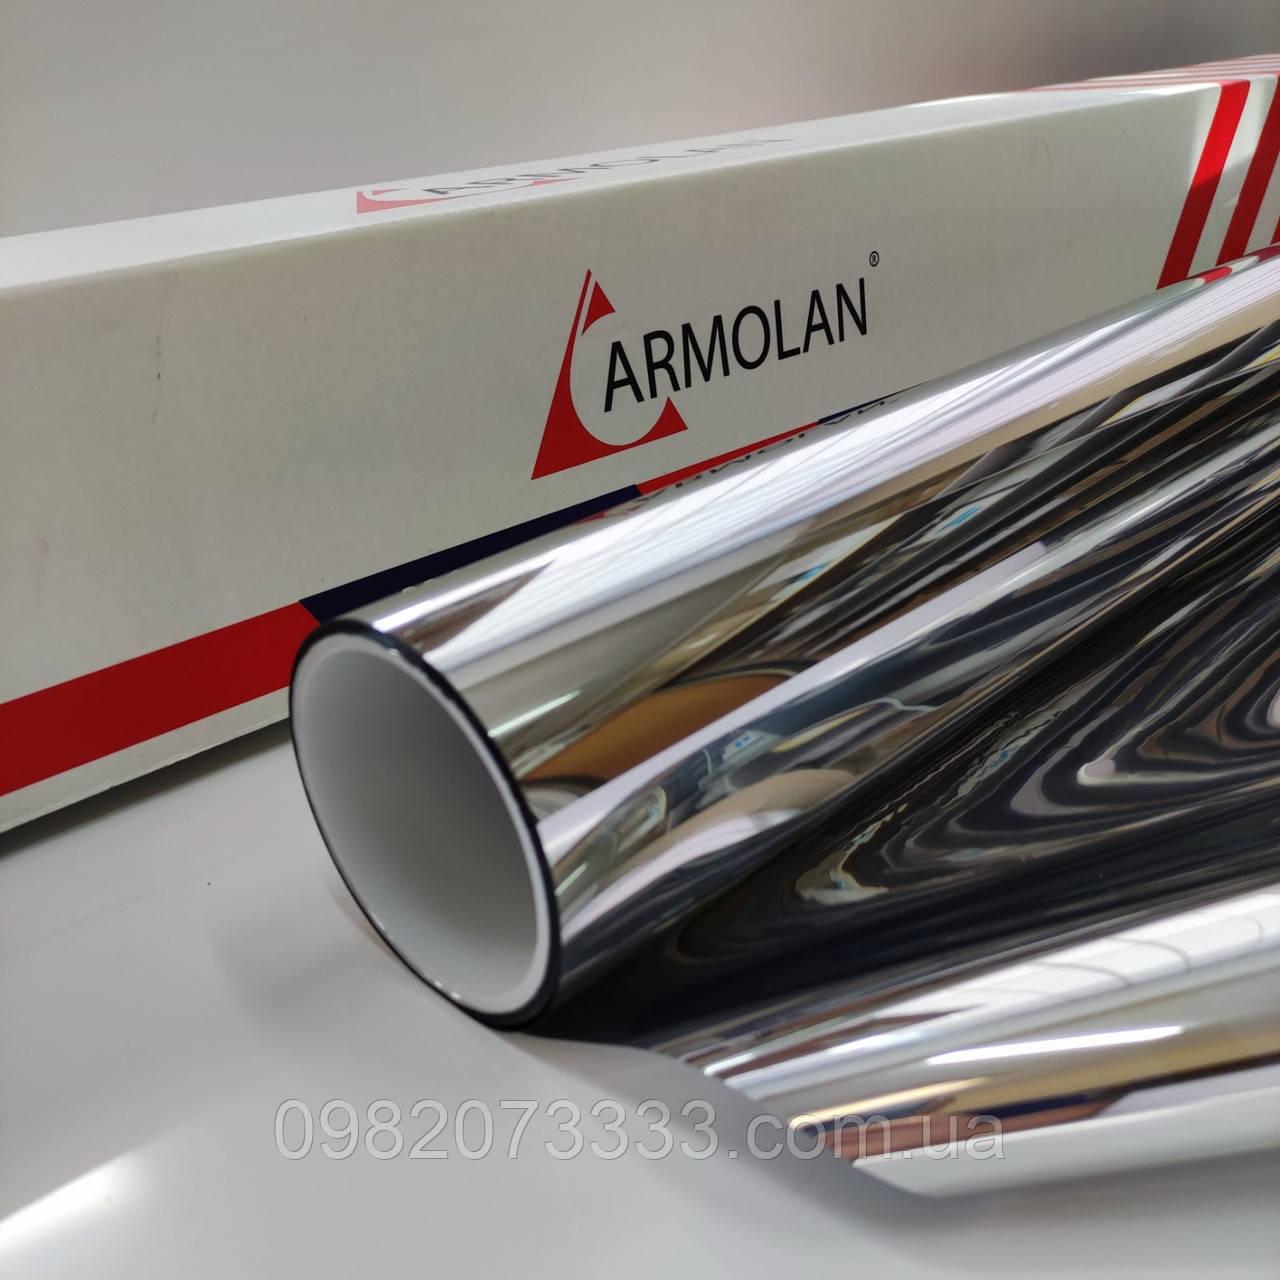 Солнцезащитная плёнка Armolan Silver 15% USA зеркальная для тонировки окон. Цена за размер 150х50см.